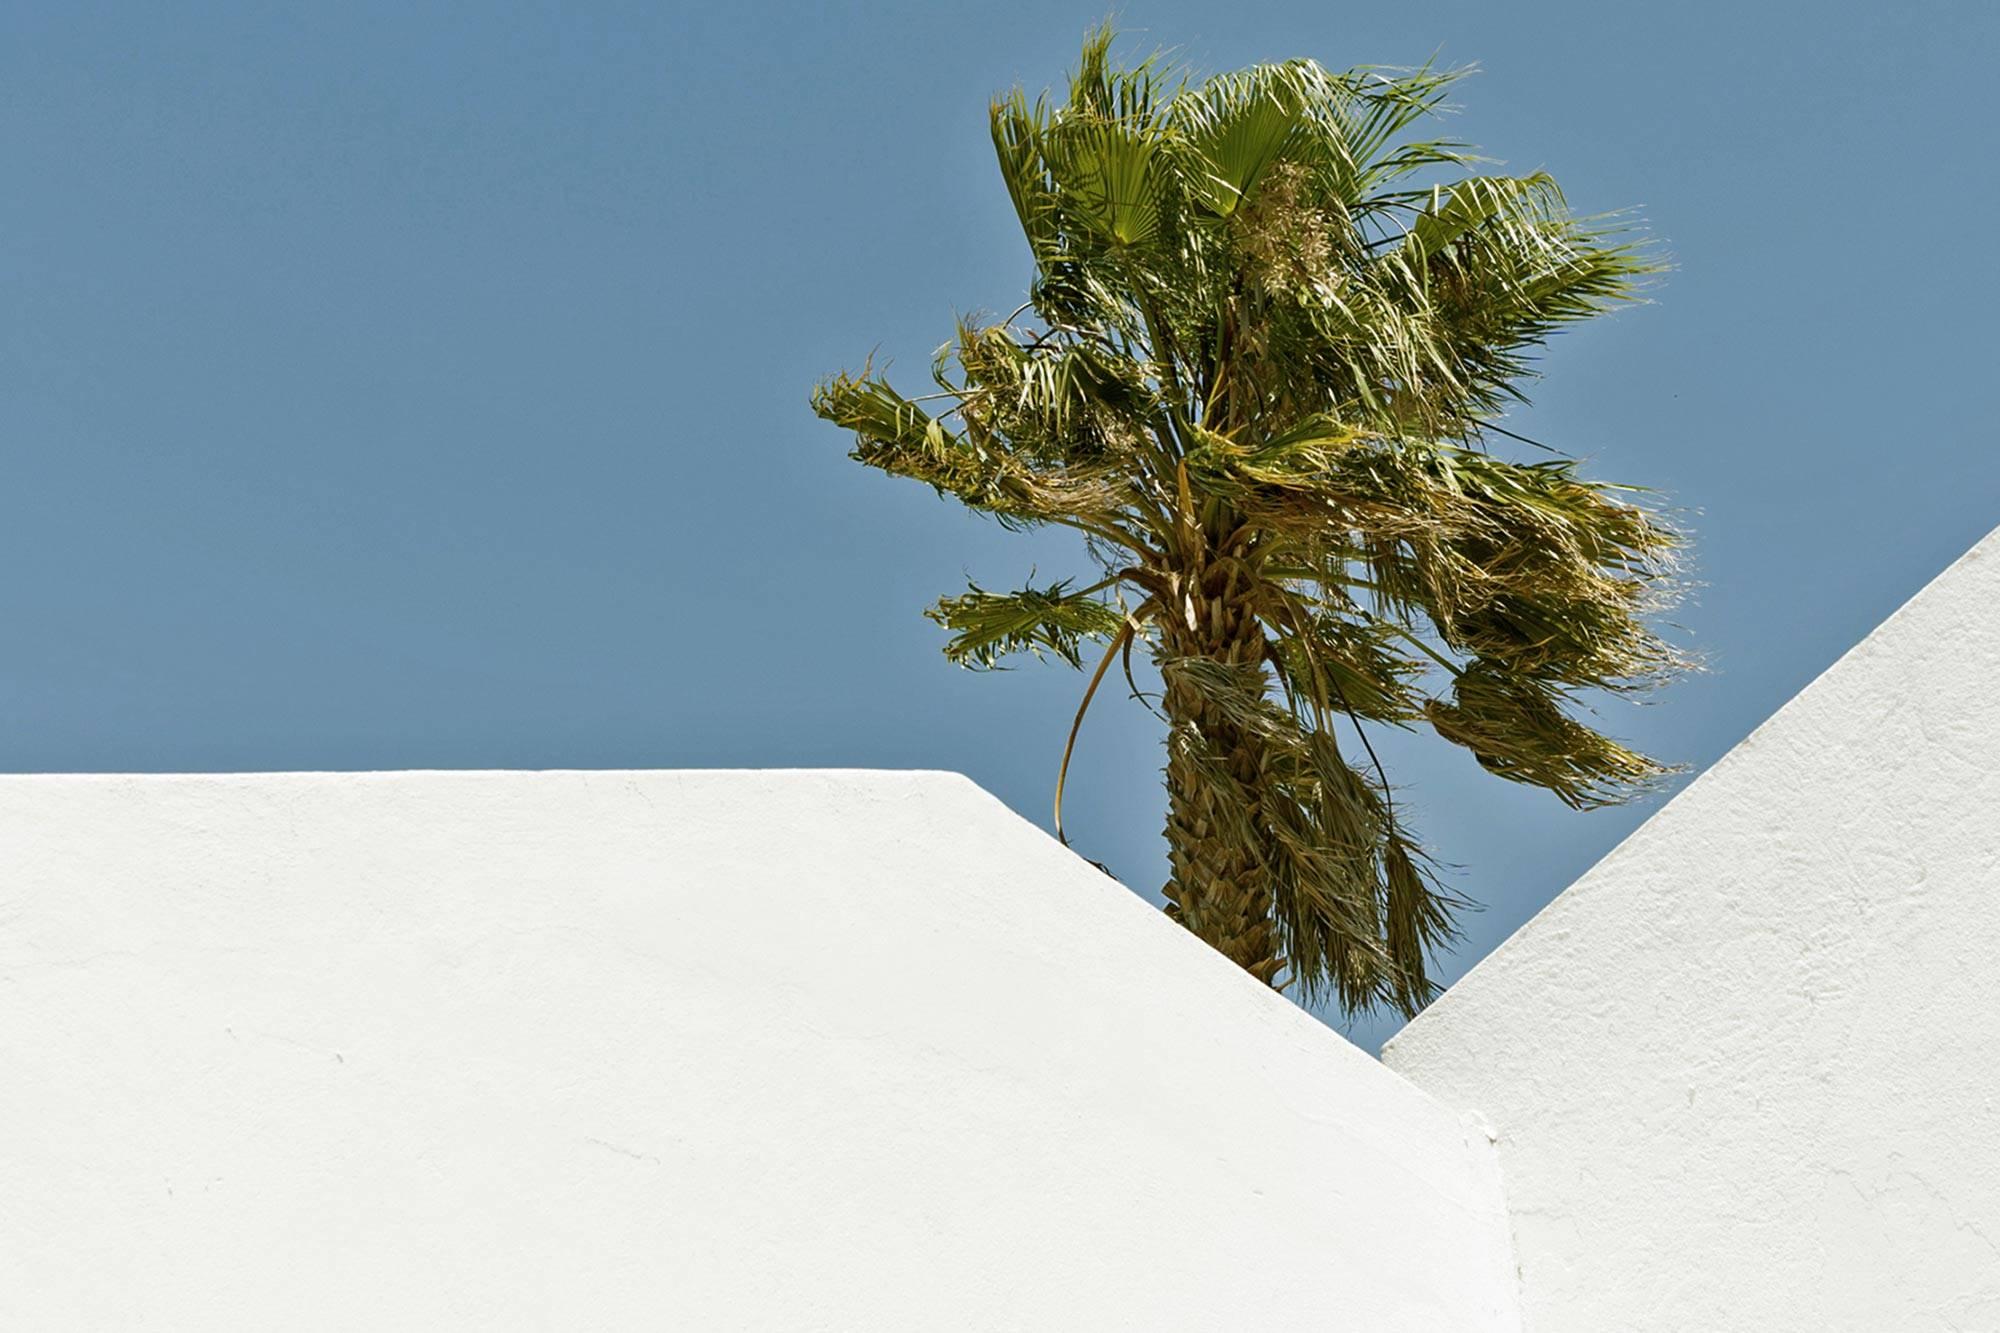 https://www.soulandsurf.com/wp-content/uploads/2021/09/RetreatsPortugal-images-S_S_Brenna-Duncan-04601.jpg